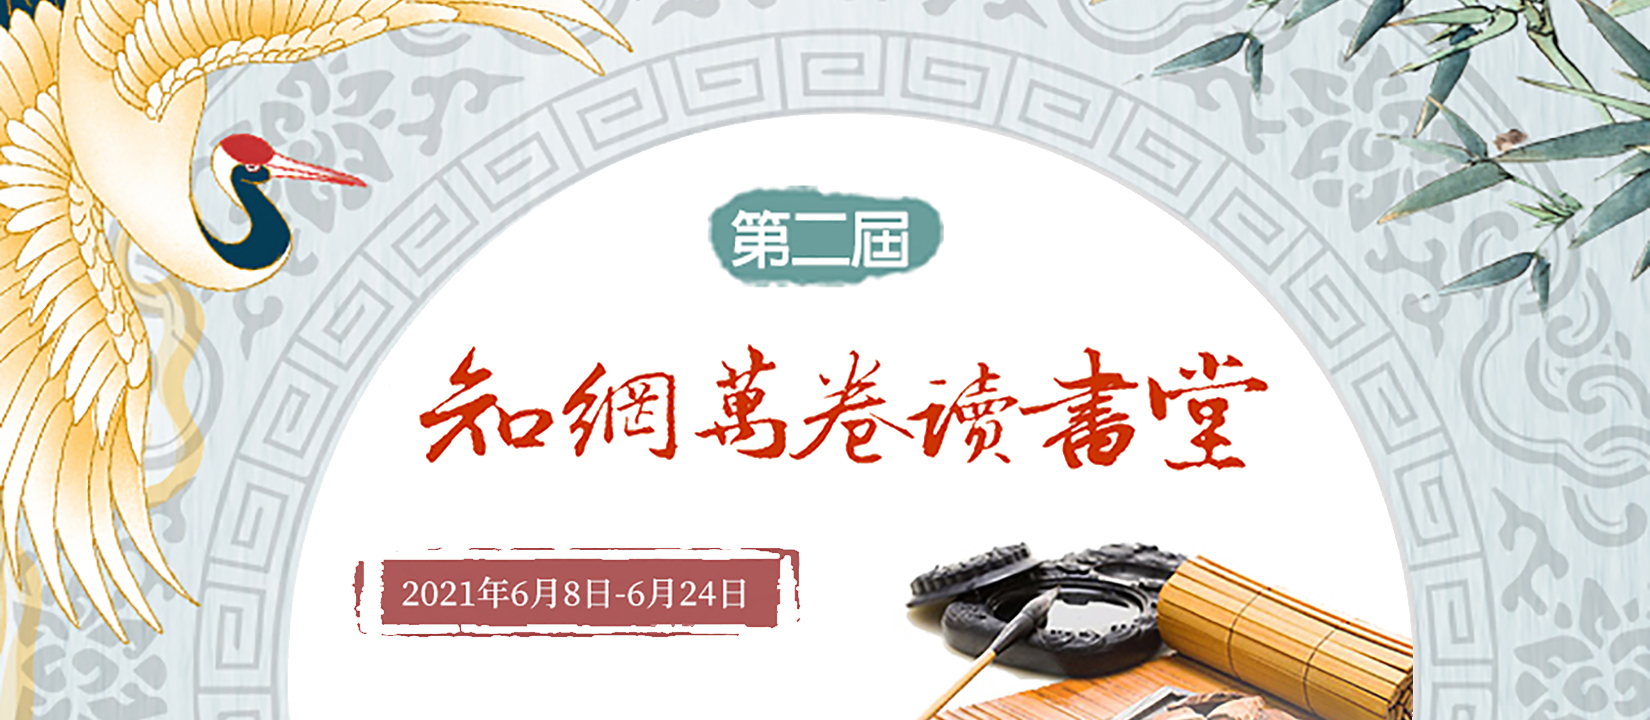 CNKI中國知網:第二屆知網萬卷讀書堂 The 2nd CNKI Read Classic Books with Experts